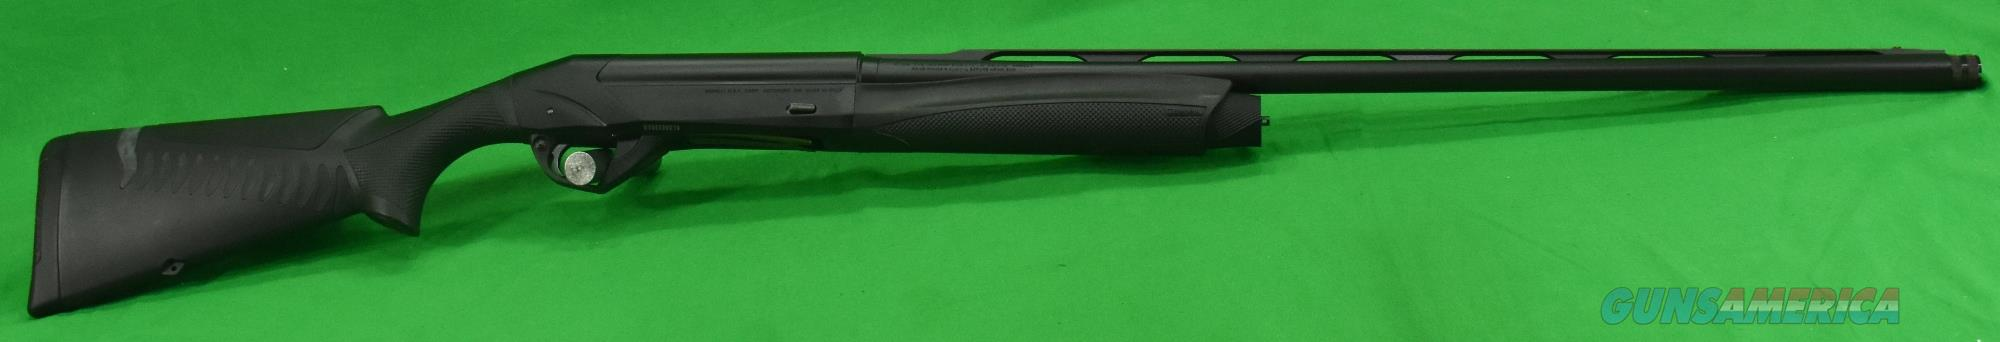 10371 Benelli Super Black Eagle 3 Black Left Handed 12 Ga 28-3.5In  Guns > Shotguns > Benelli Shotguns > Sporting